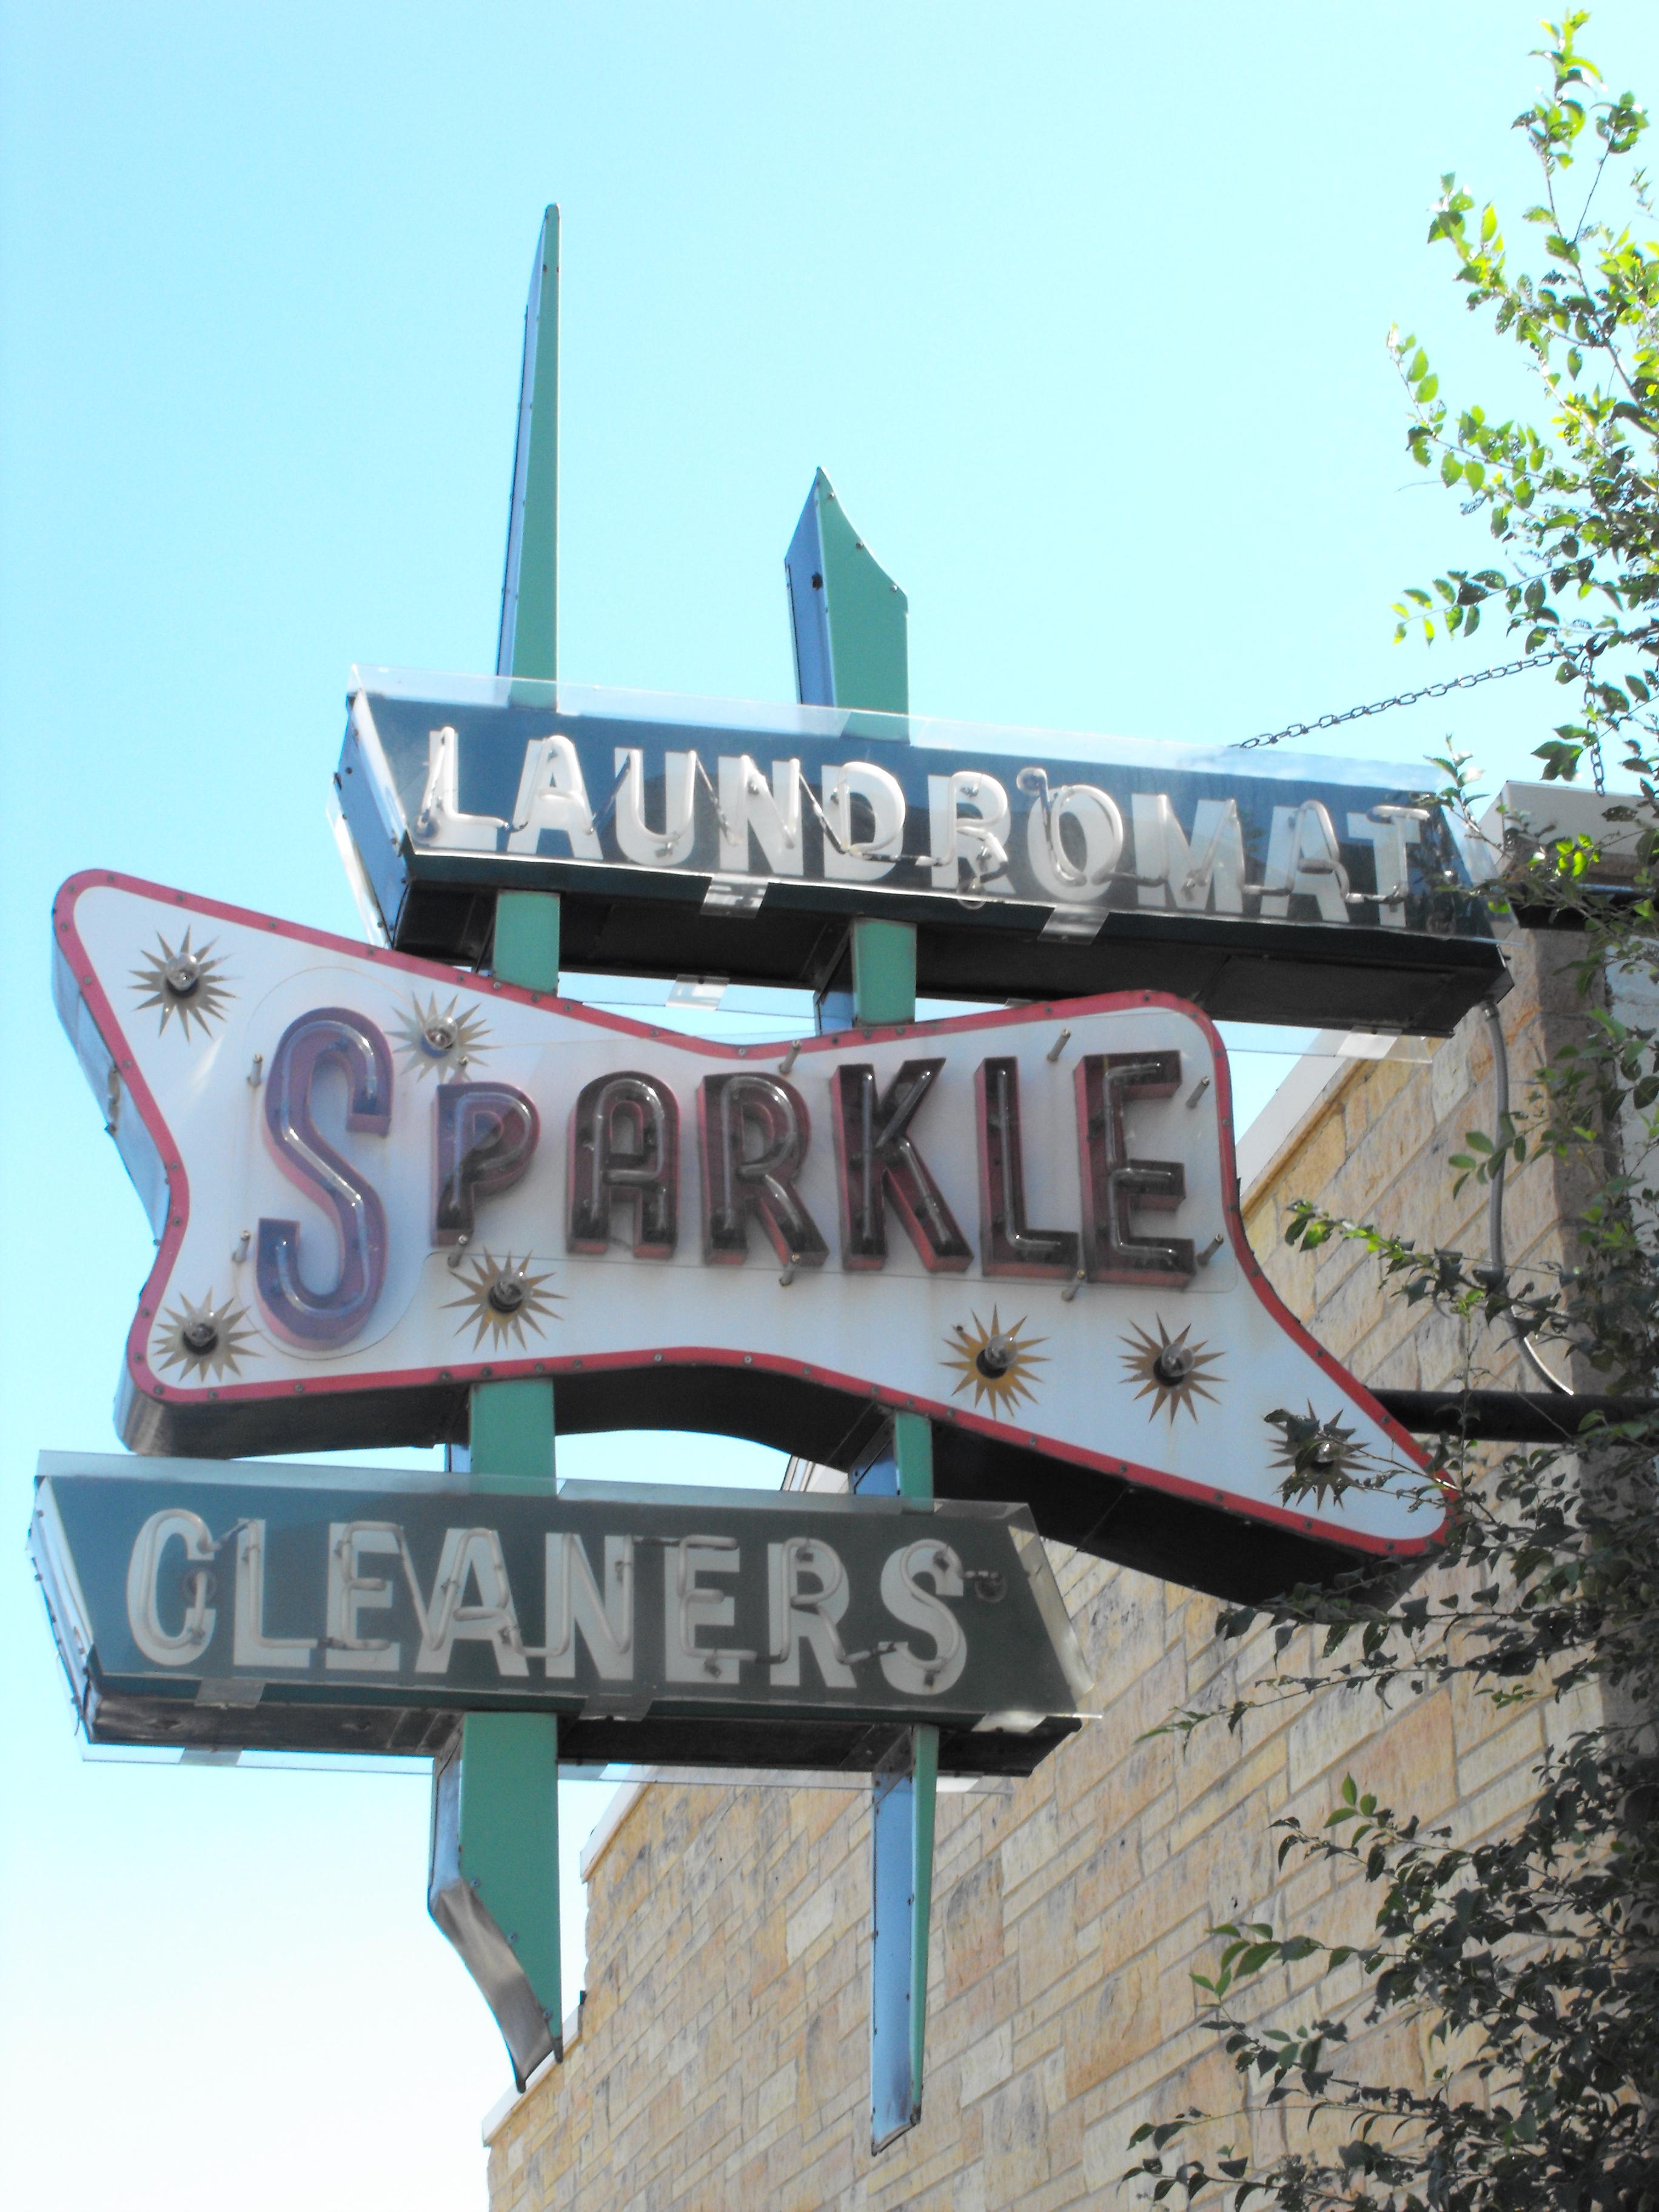 Sparkle Cleaners Laundromat - 225 East Walnut Street, Oglesby, Illinois U.S.A. - September 20, 2009